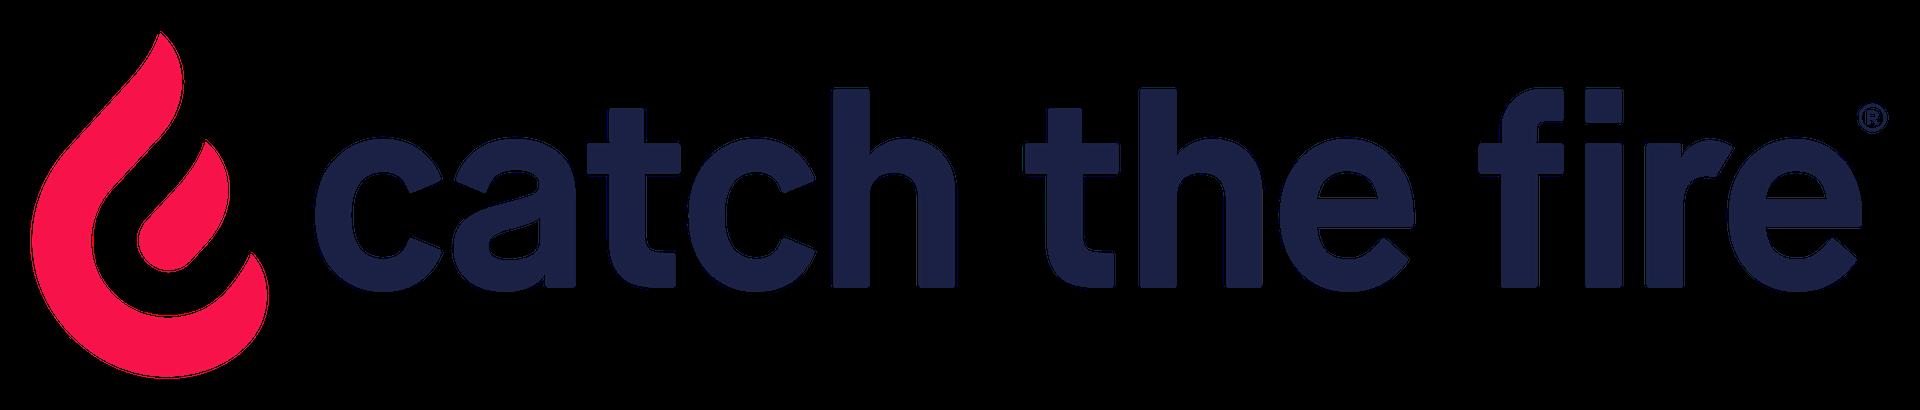 ctf logo donker